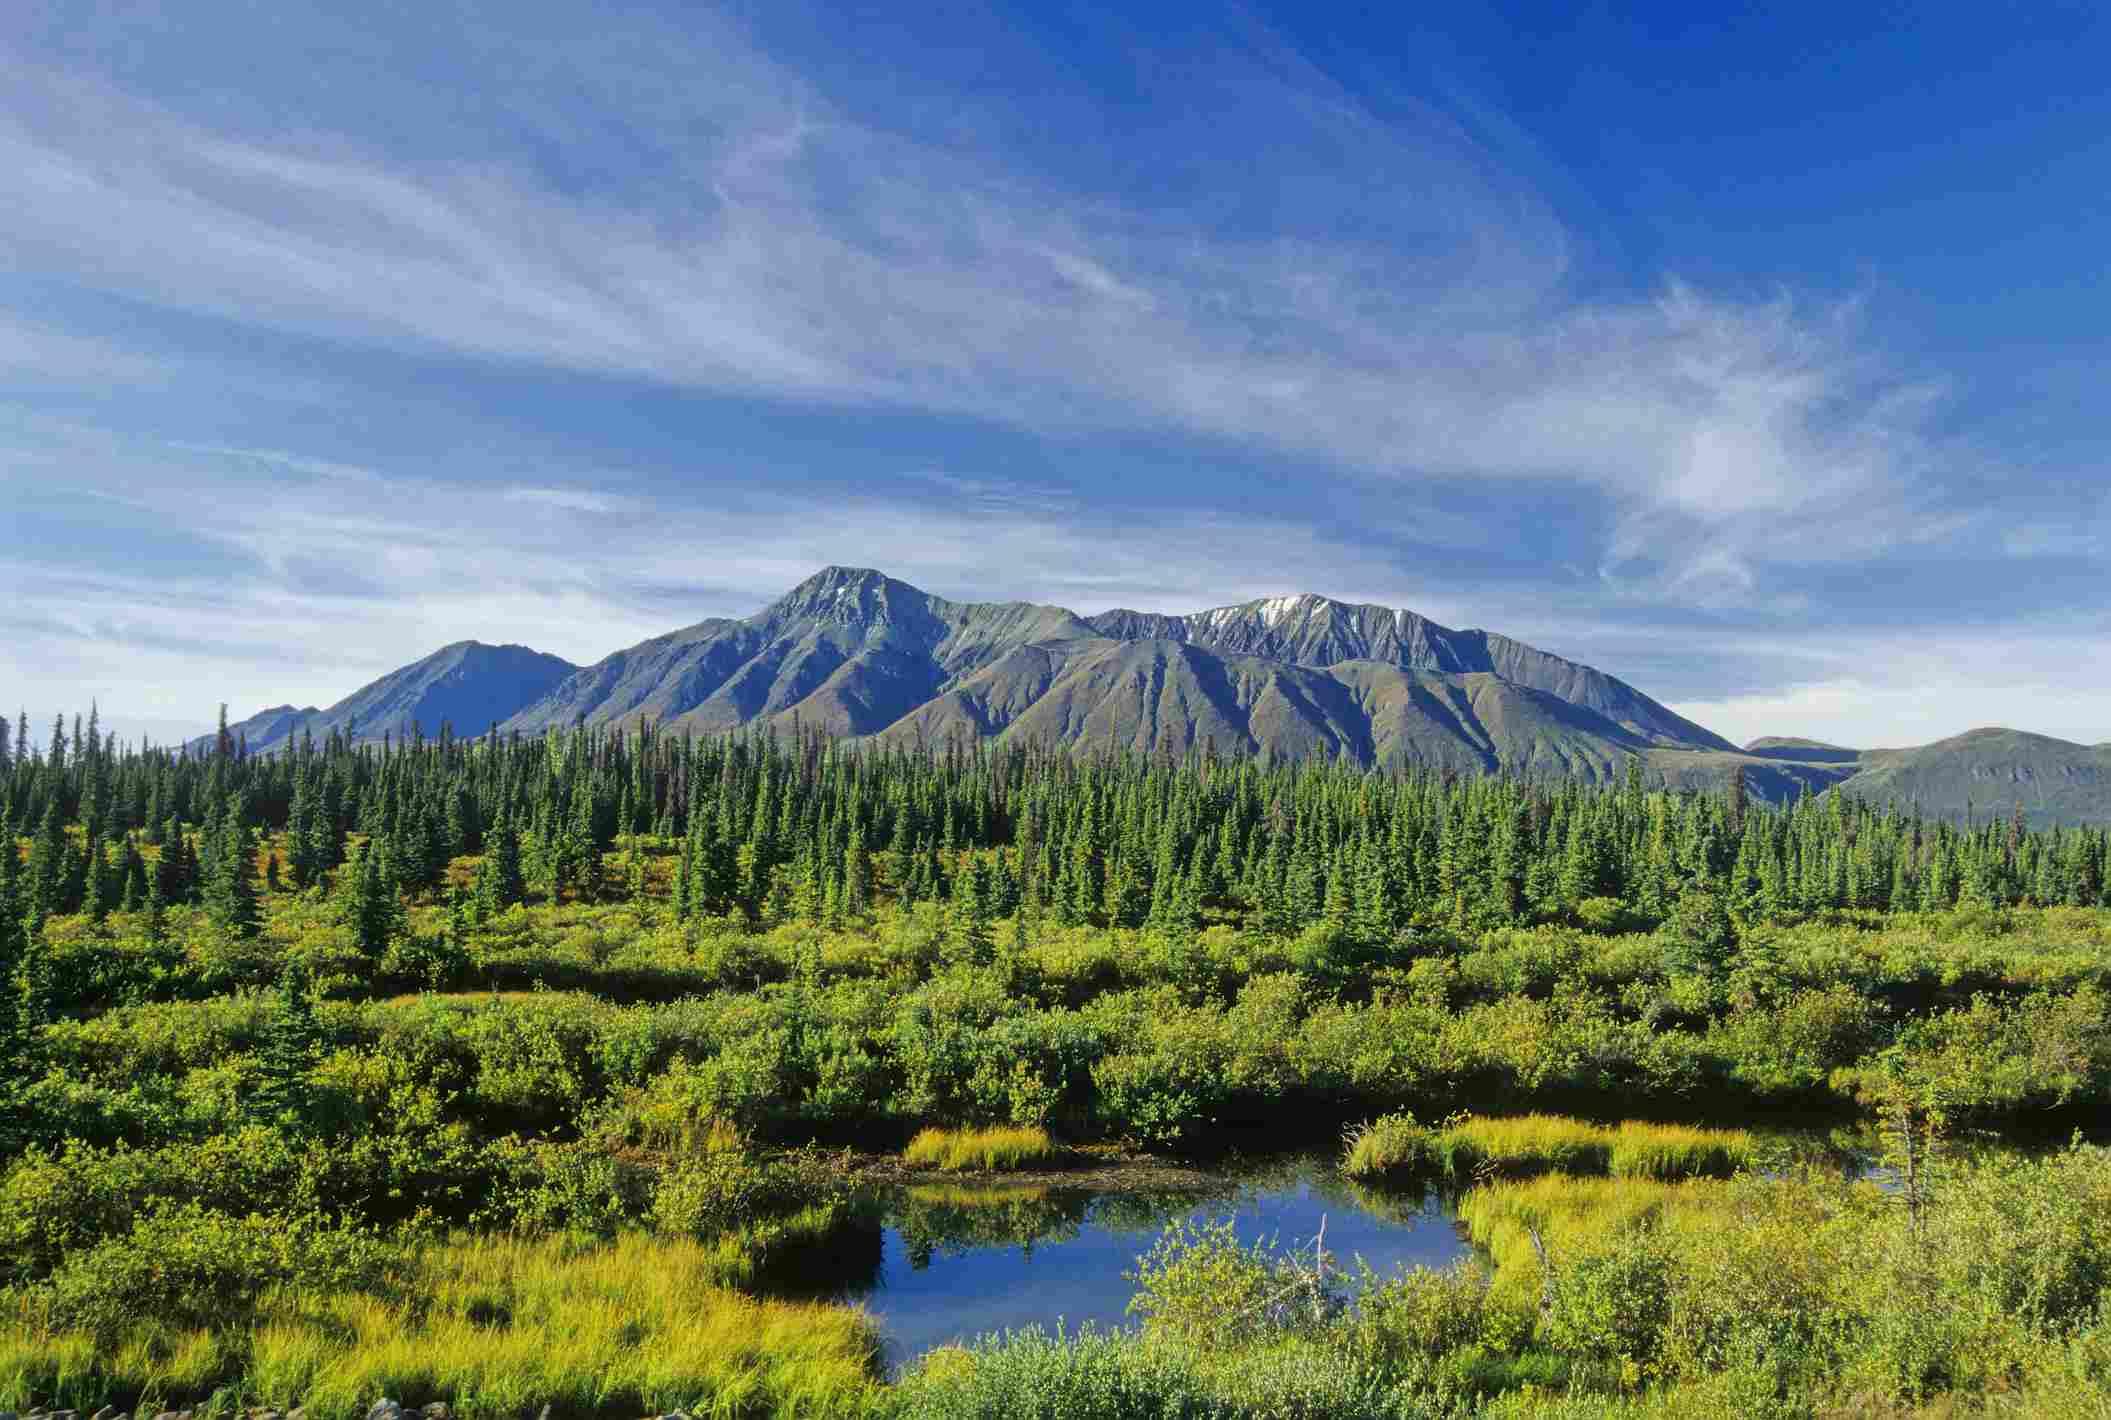 Kluane National Park in the Yukon